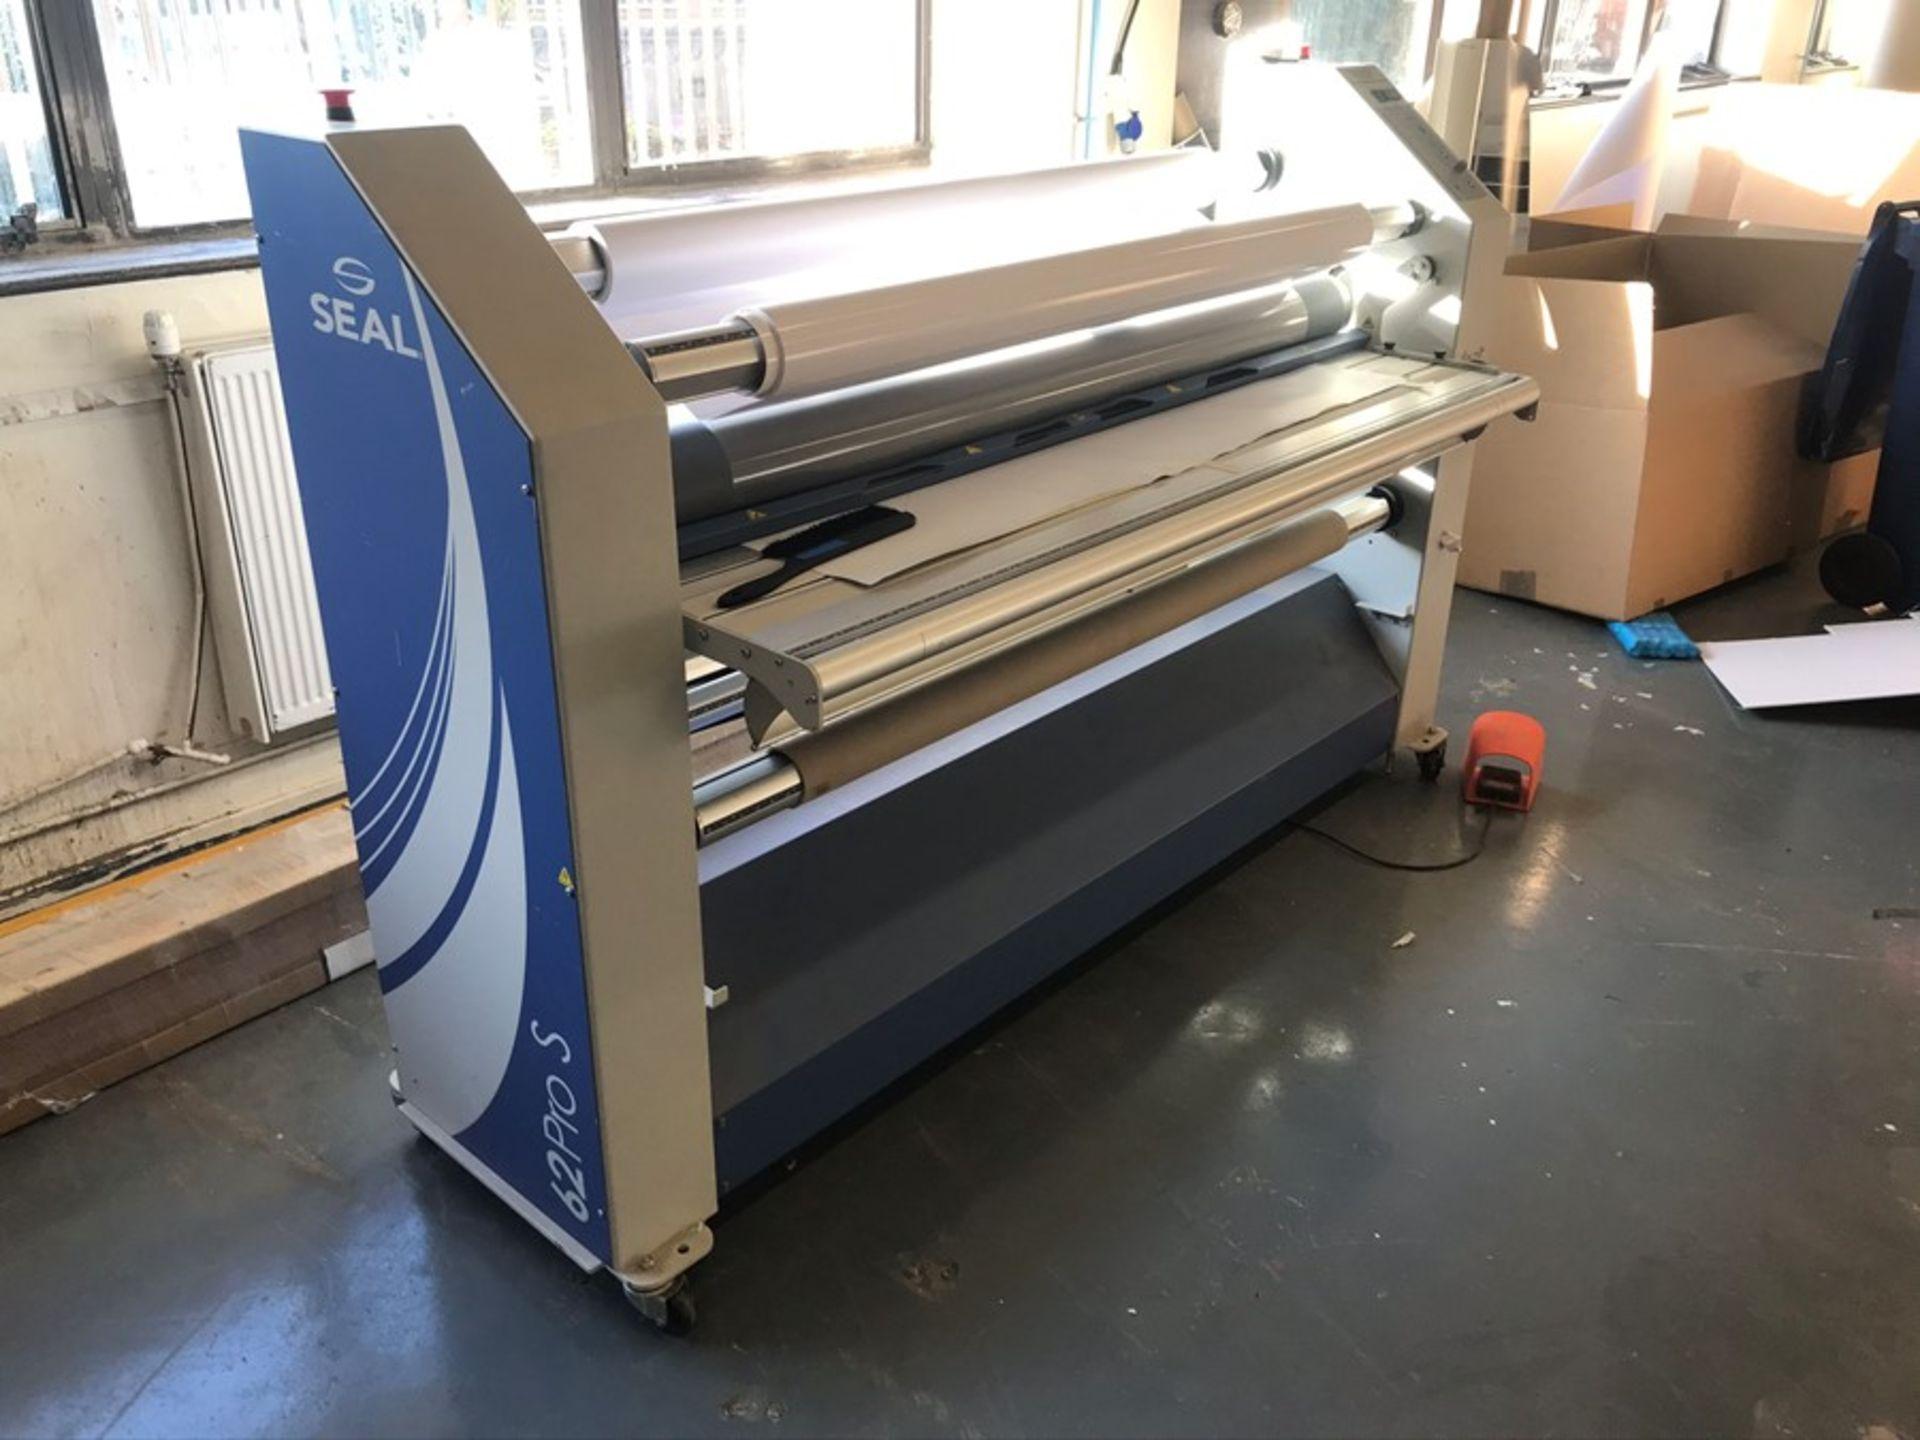 Seal 62S single heated laminator (2014)